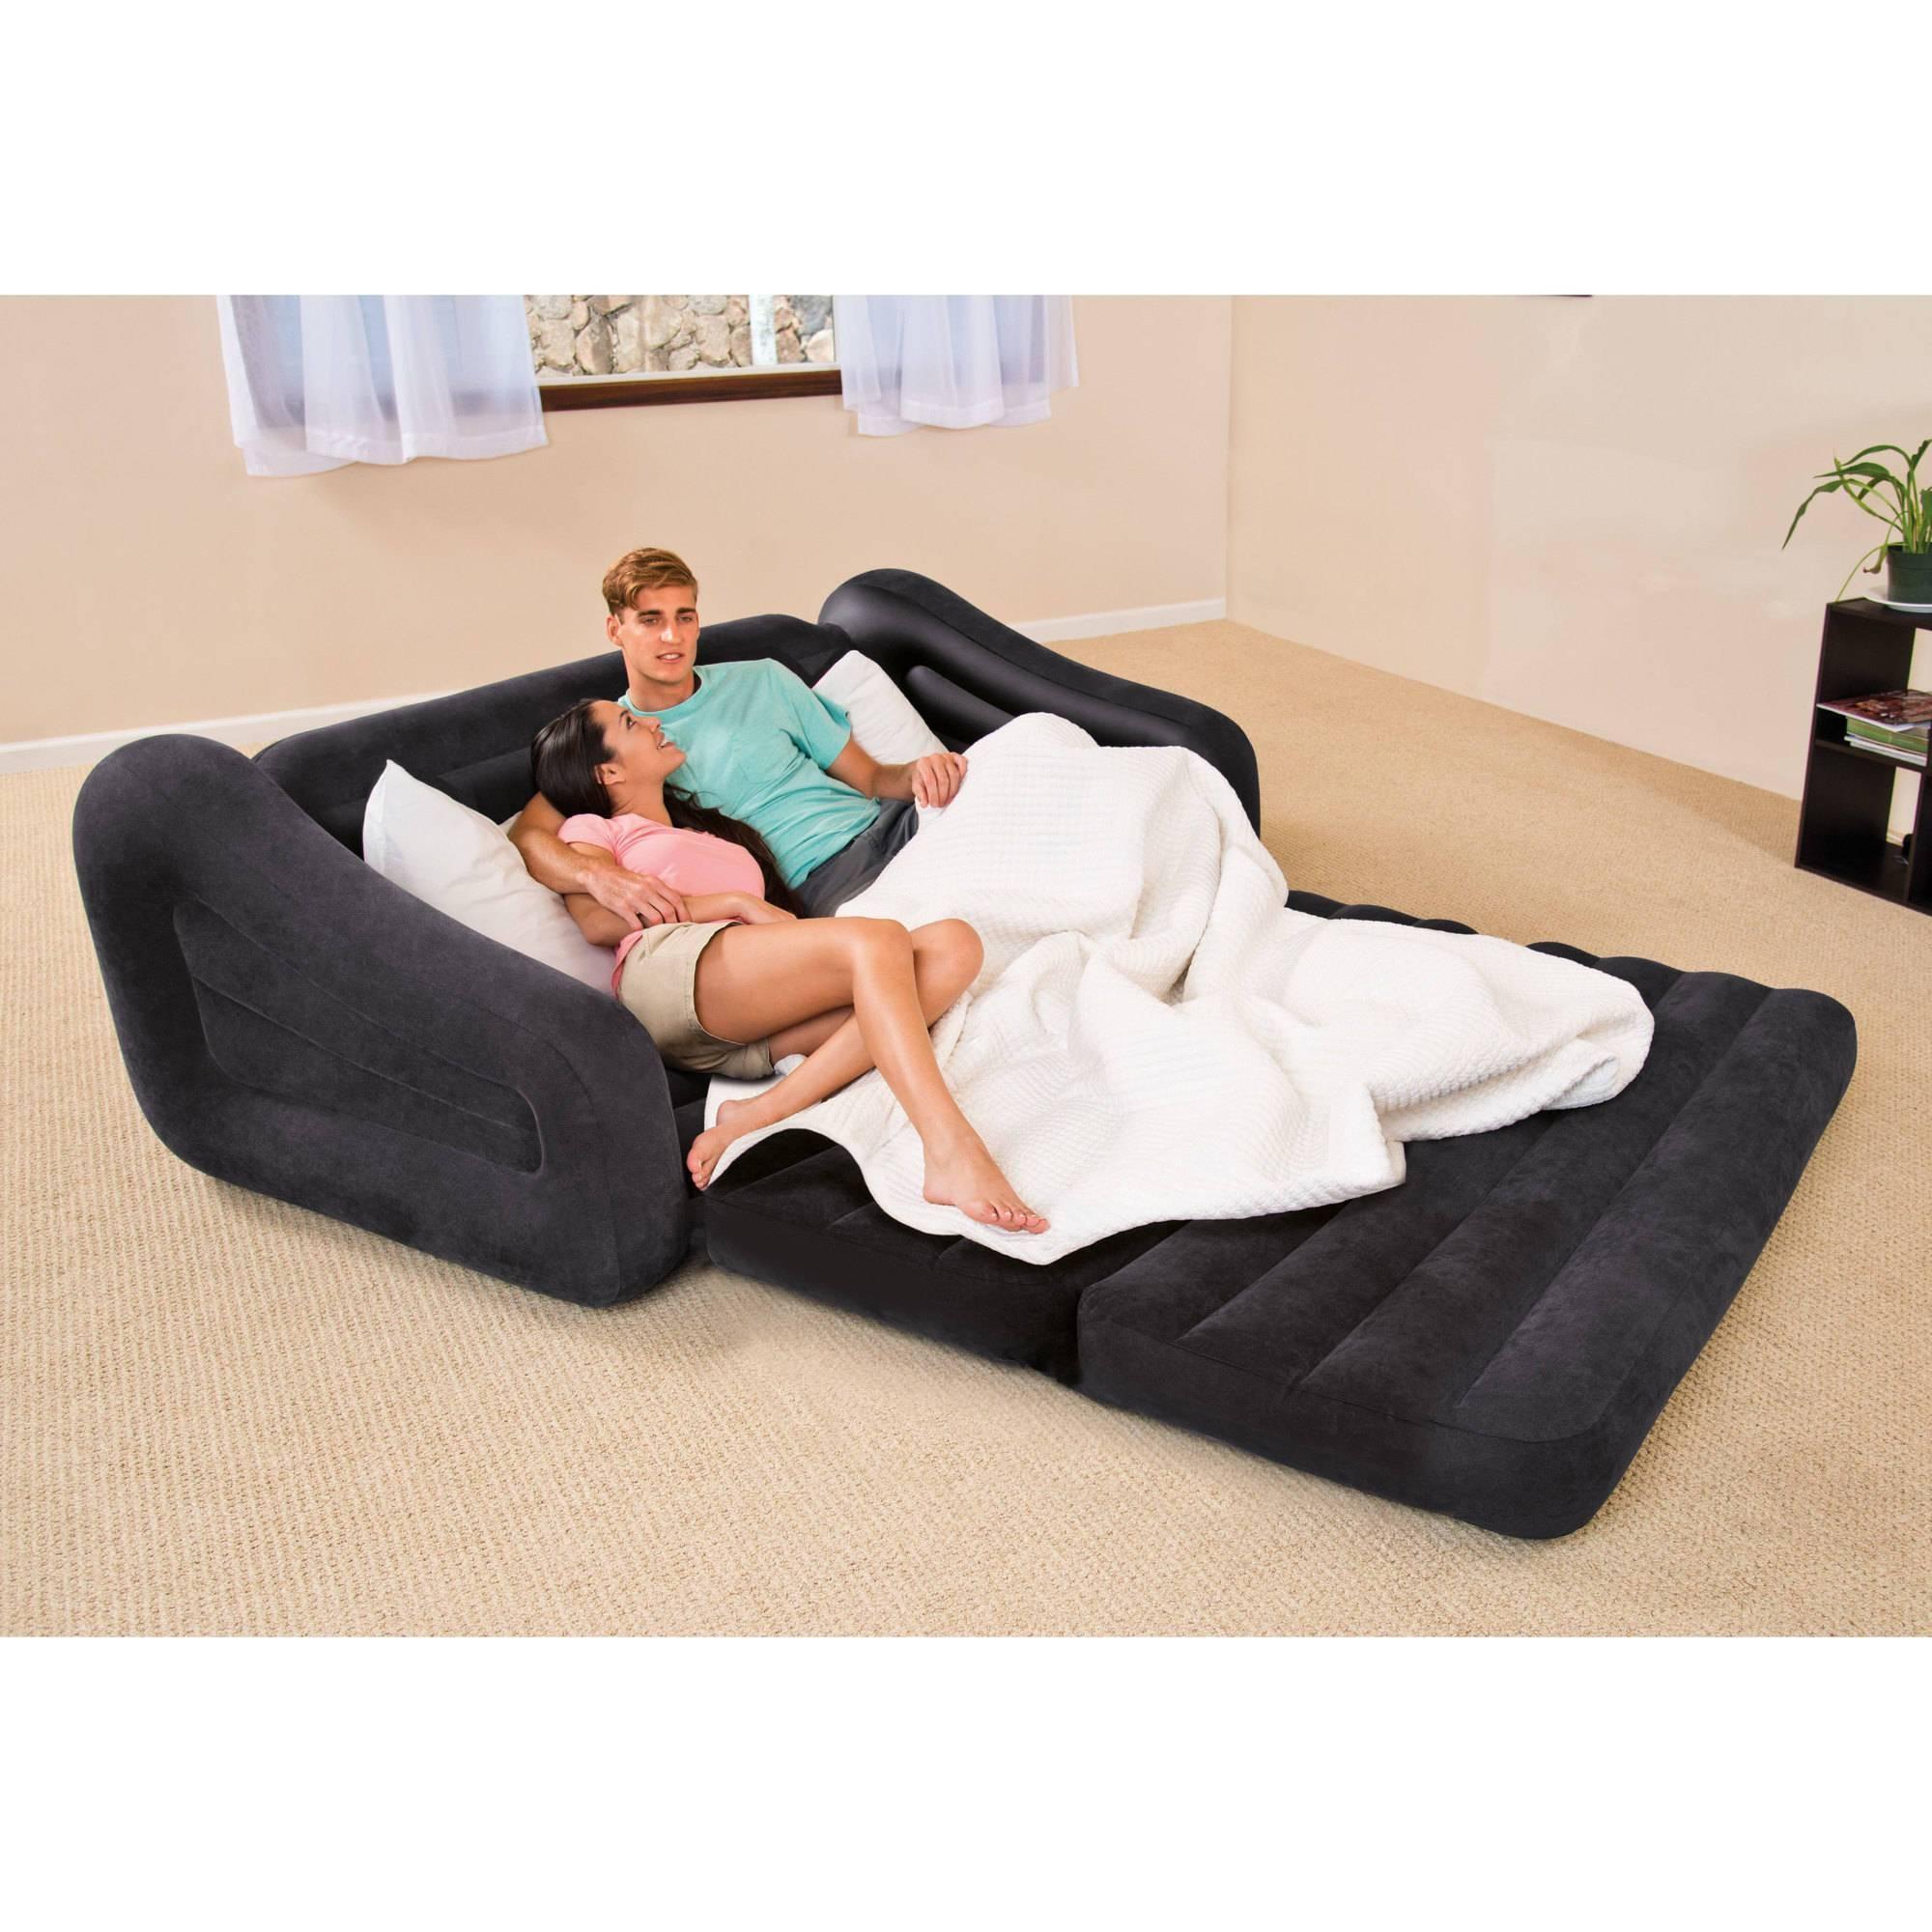 Intex Queen Inflatable Pull Out Sofa Bed - Walmart regarding Intex Queen Sleeper Sofas (Image 11 of 15)